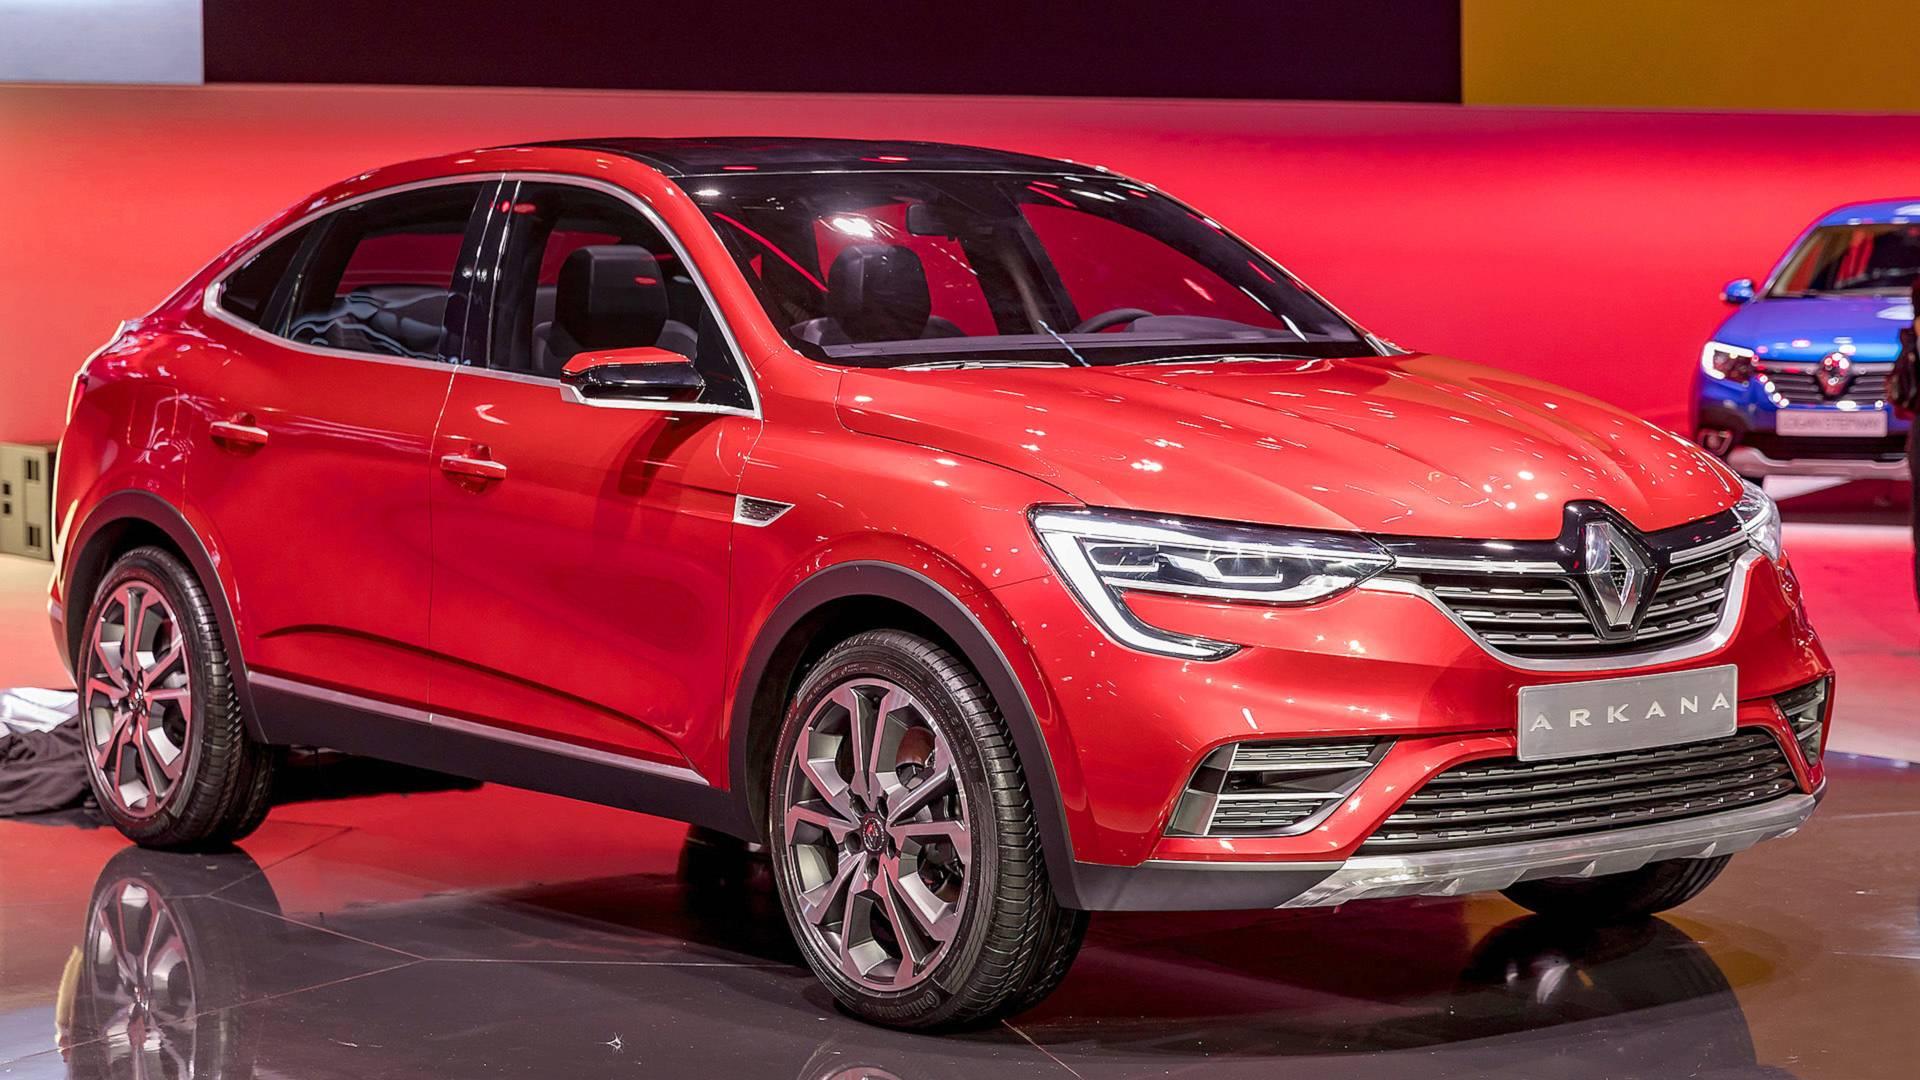 Renault Arkana Revealed at 2018 Moscow International Motor Show 9